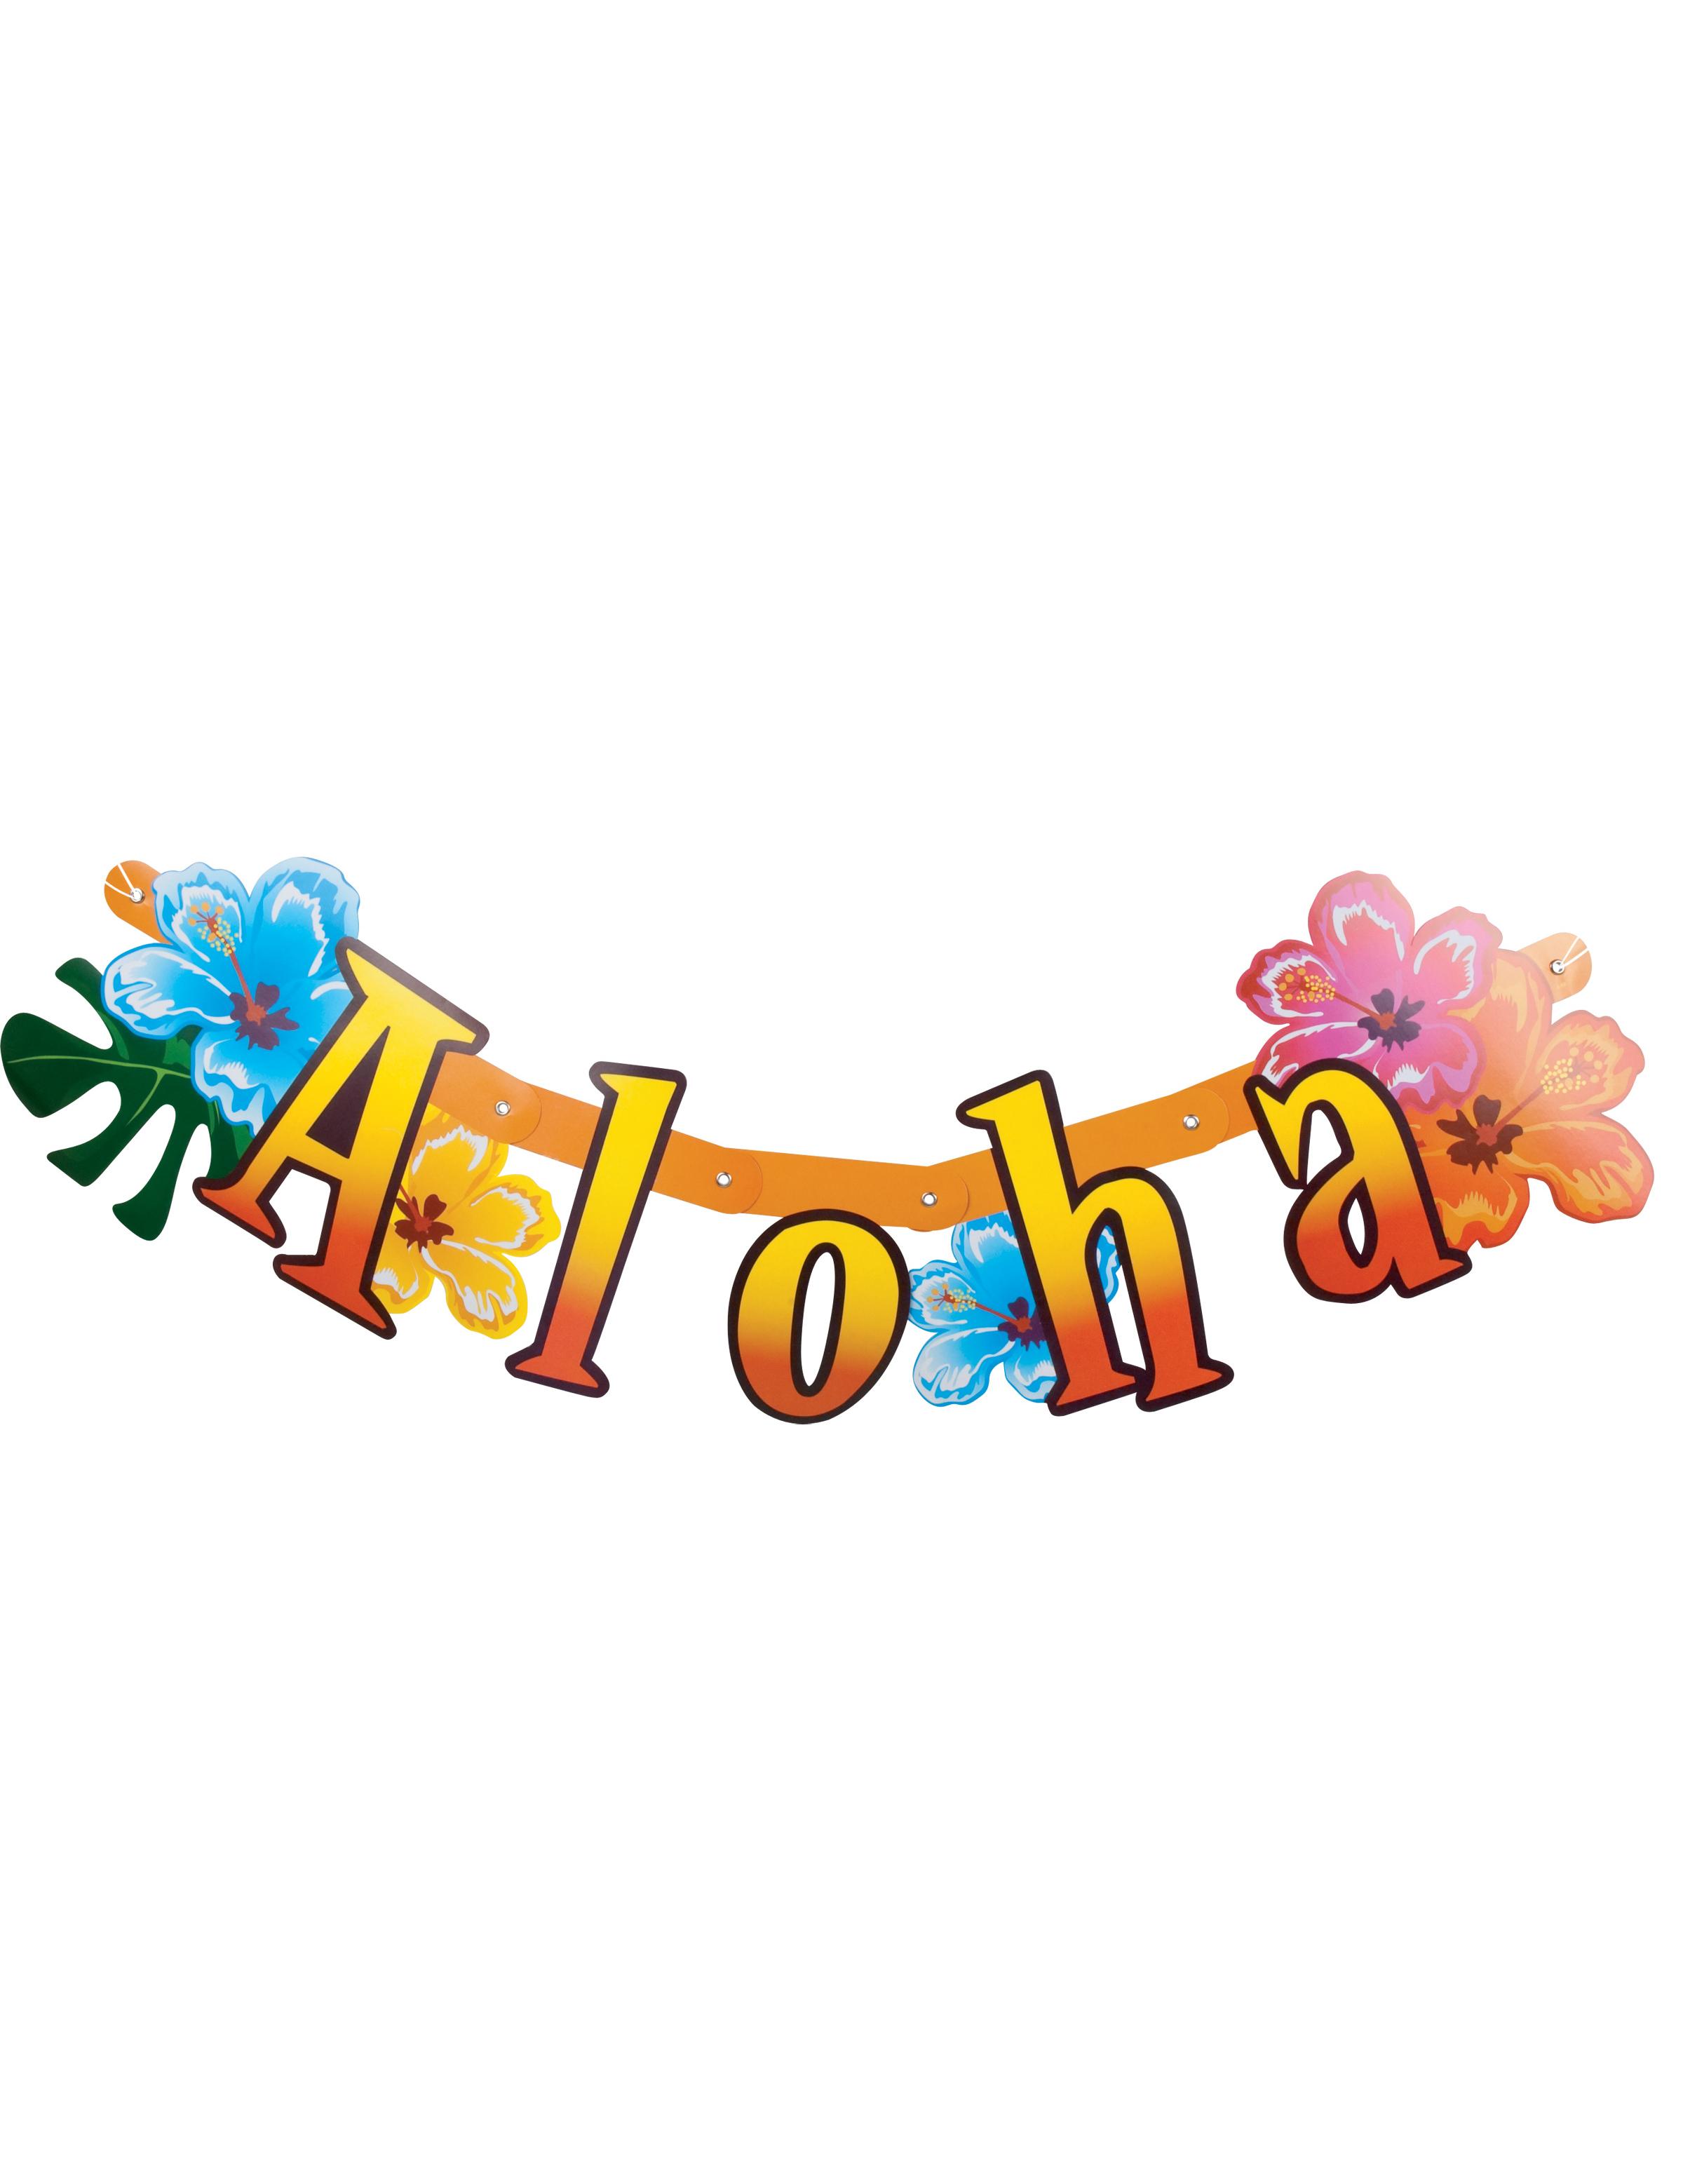 hawaii banner girlande s dsee party deko bunt 83x17cm g nstige faschings partydeko zubeh r. Black Bedroom Furniture Sets. Home Design Ideas